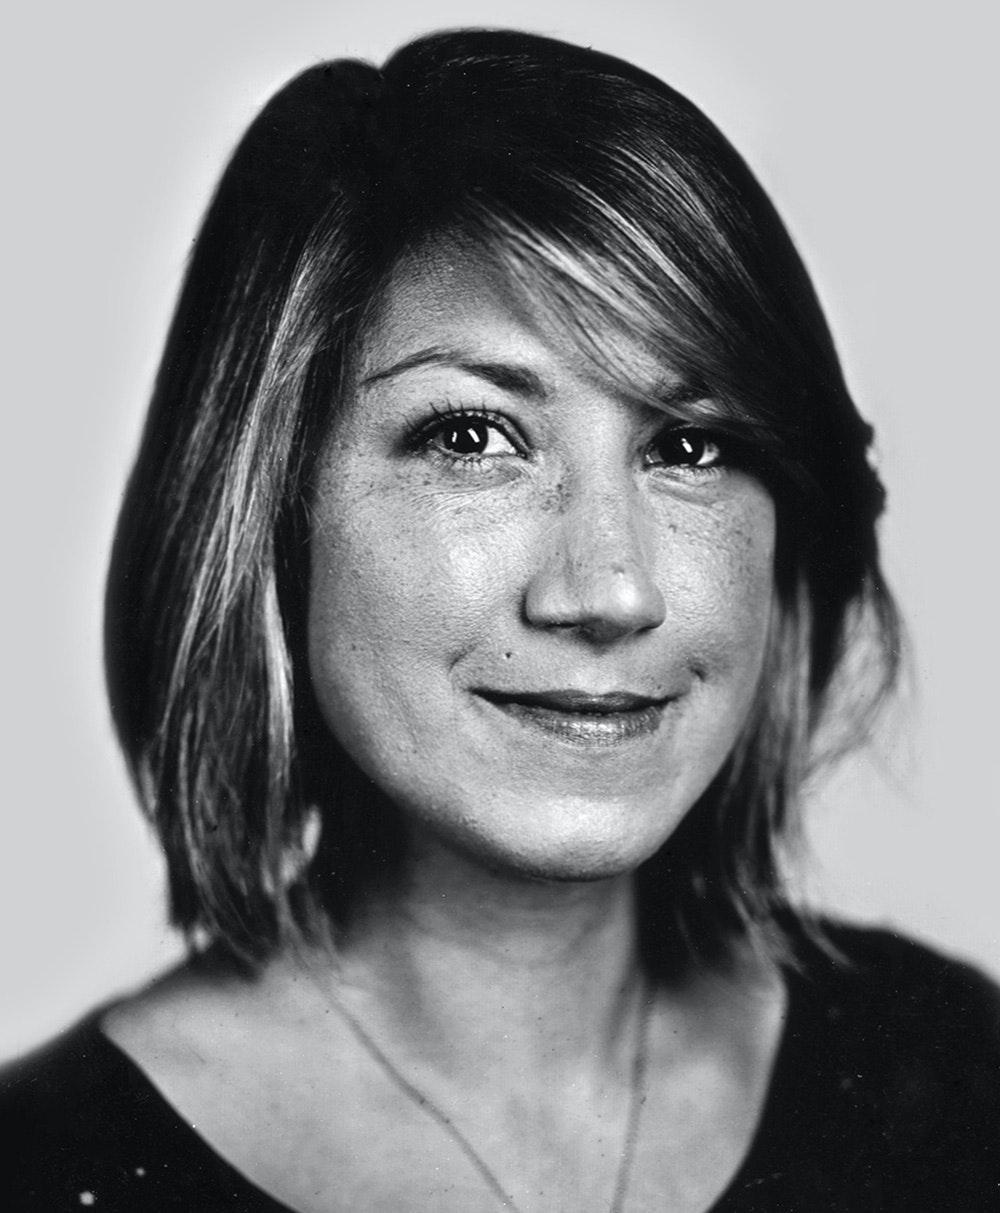 Jessica Hische